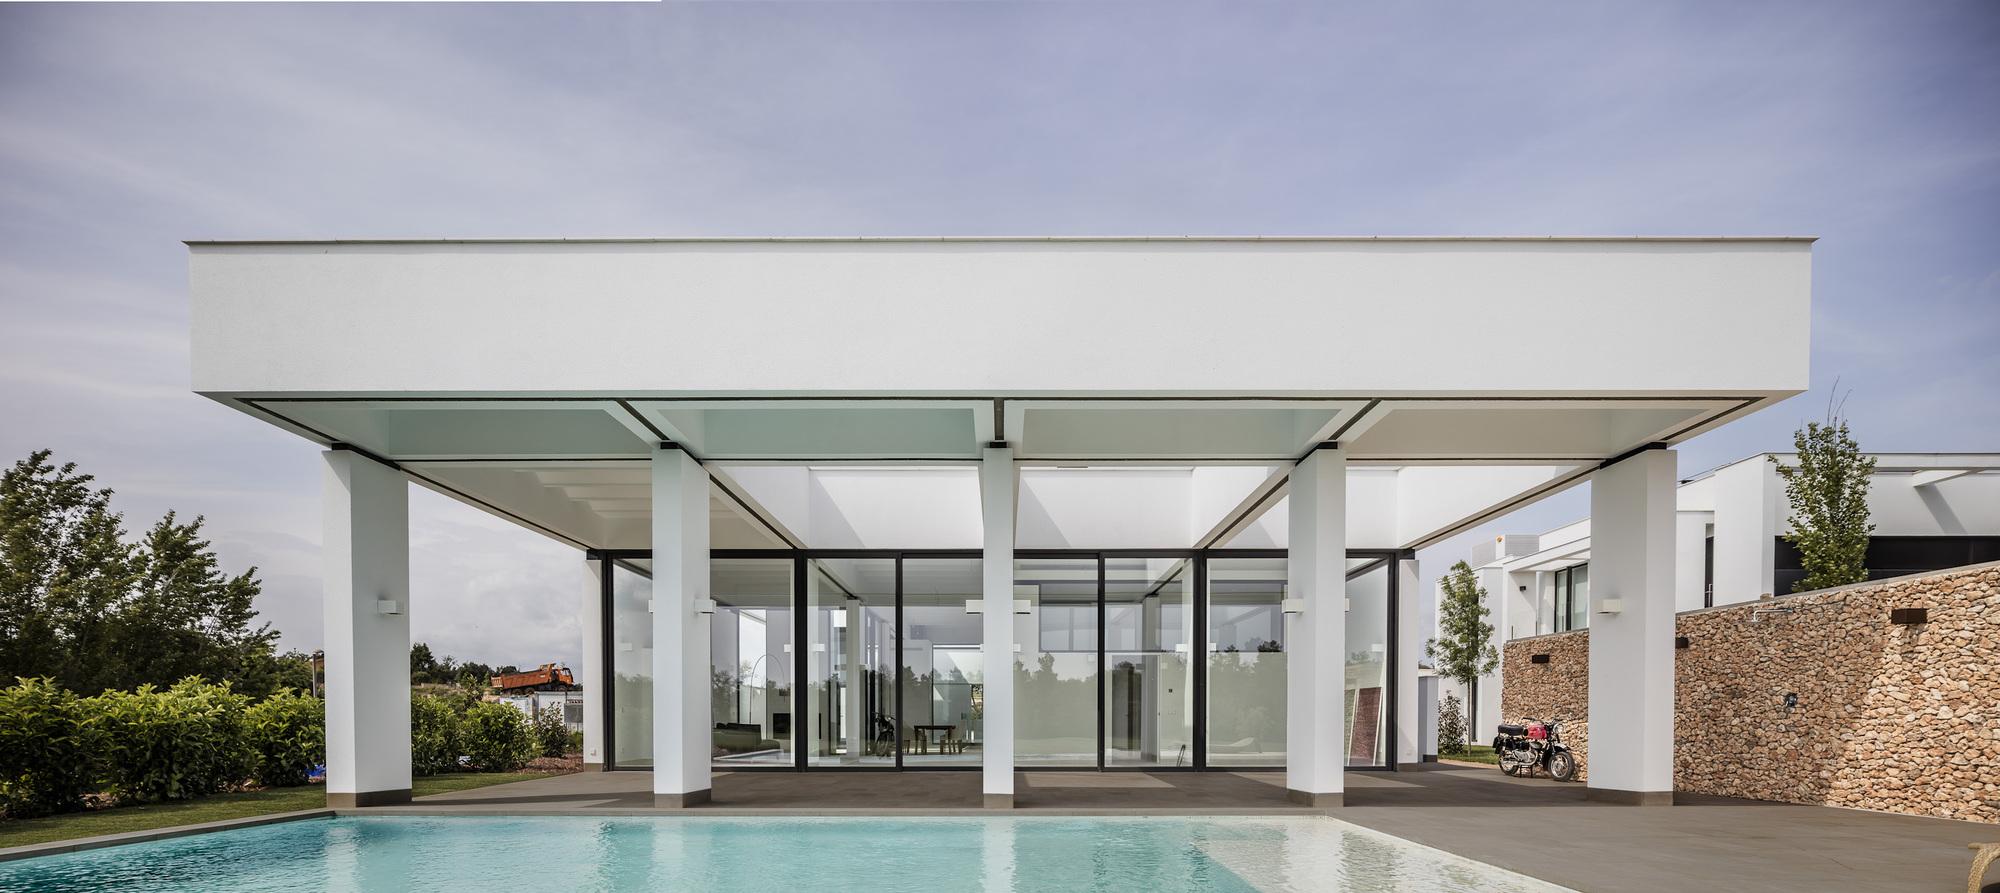 Gallery of 3 patios house lagula arquitectes 1 for Arquitectes girona